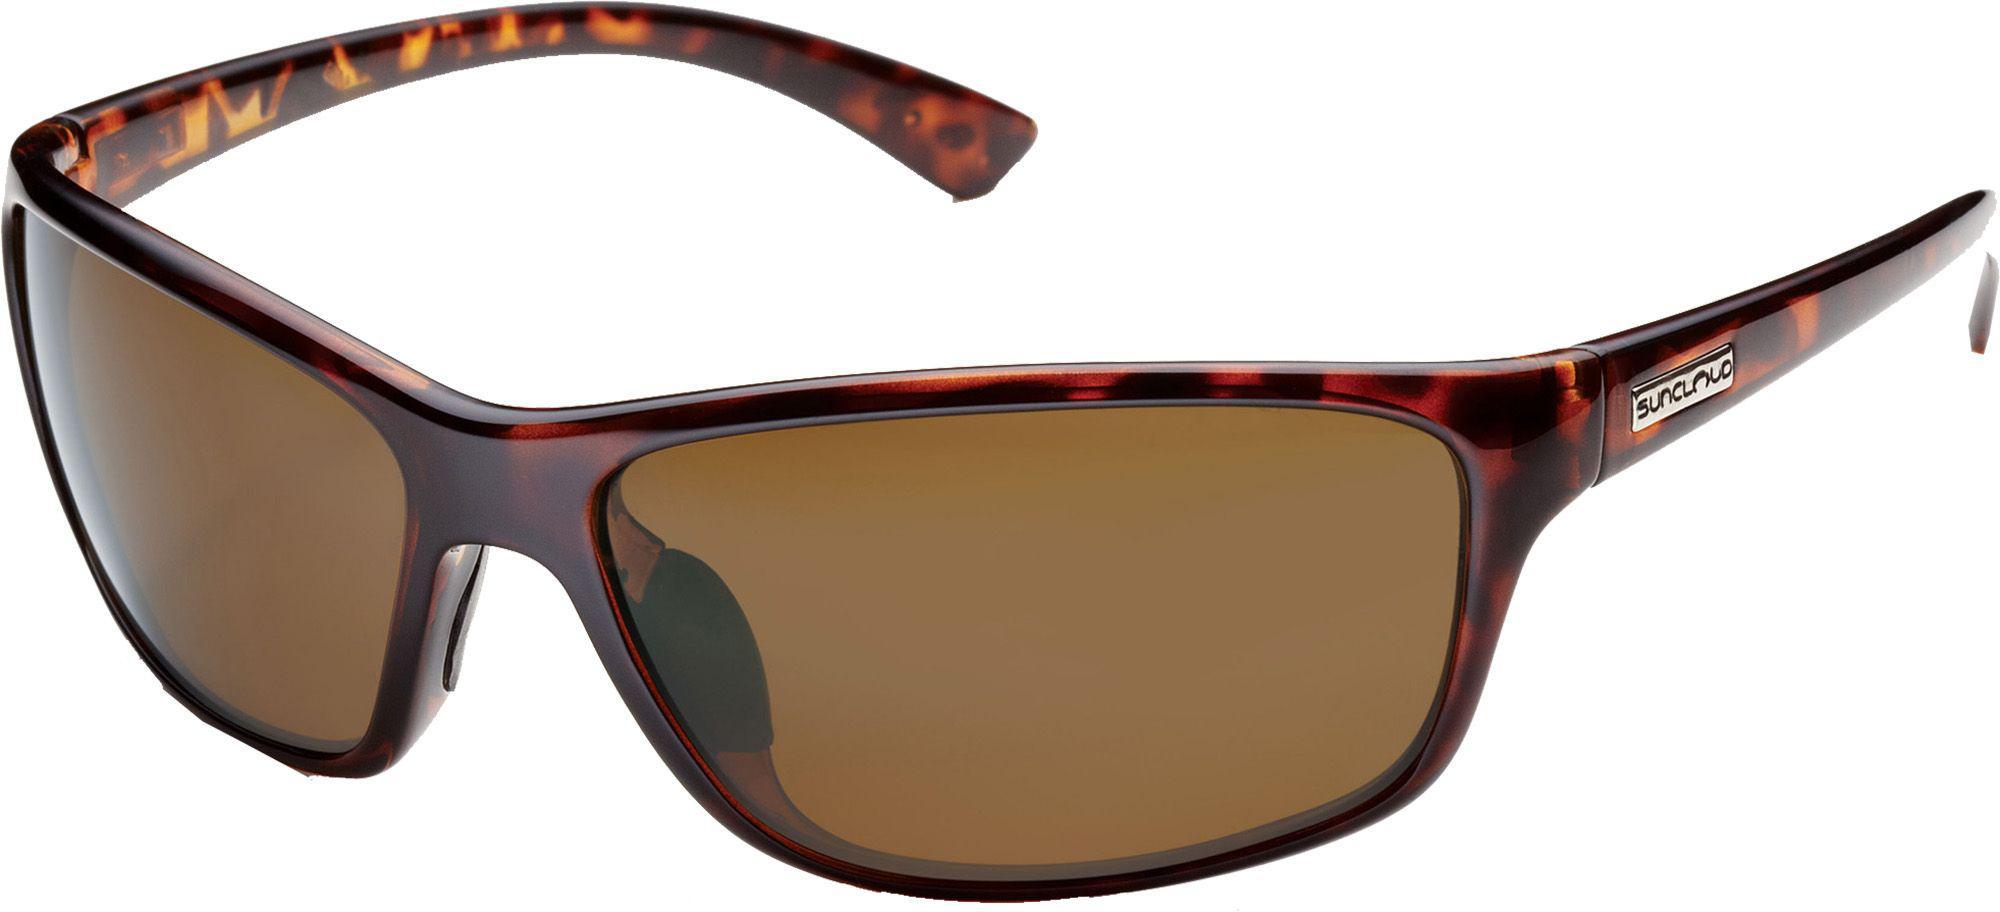 3c6ebd3834826 Lyst - Smith Optics Sentry Polarized Sunglasses in Brown for Men